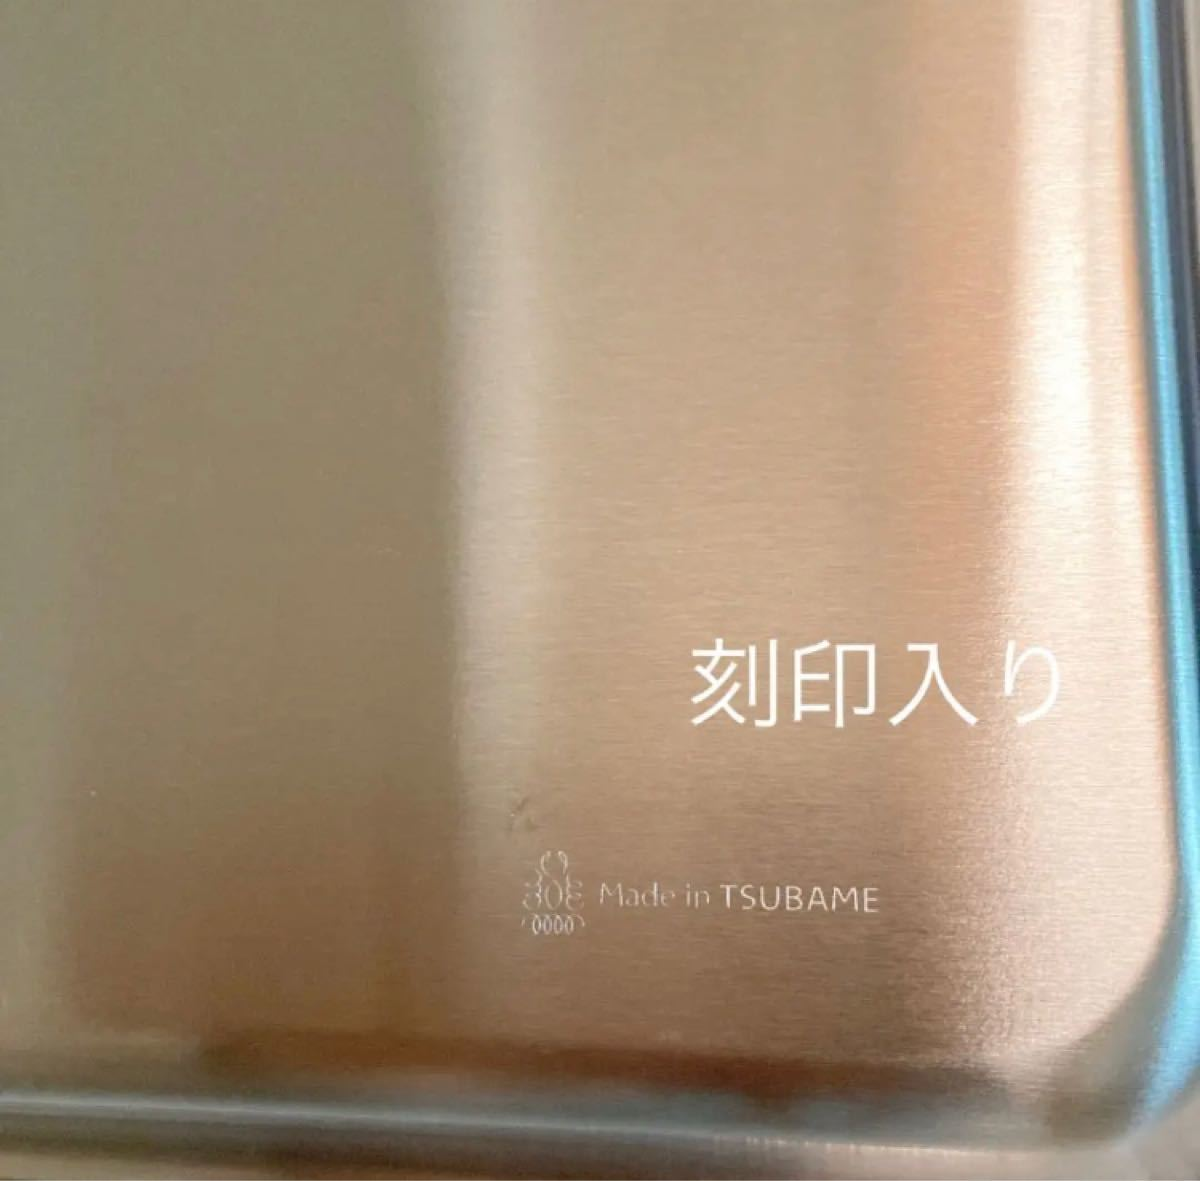 MADE in TSUBAME ステンレス網付きバット 3セット 新品 日本製 新潟県燕市燕三条 刻印入り